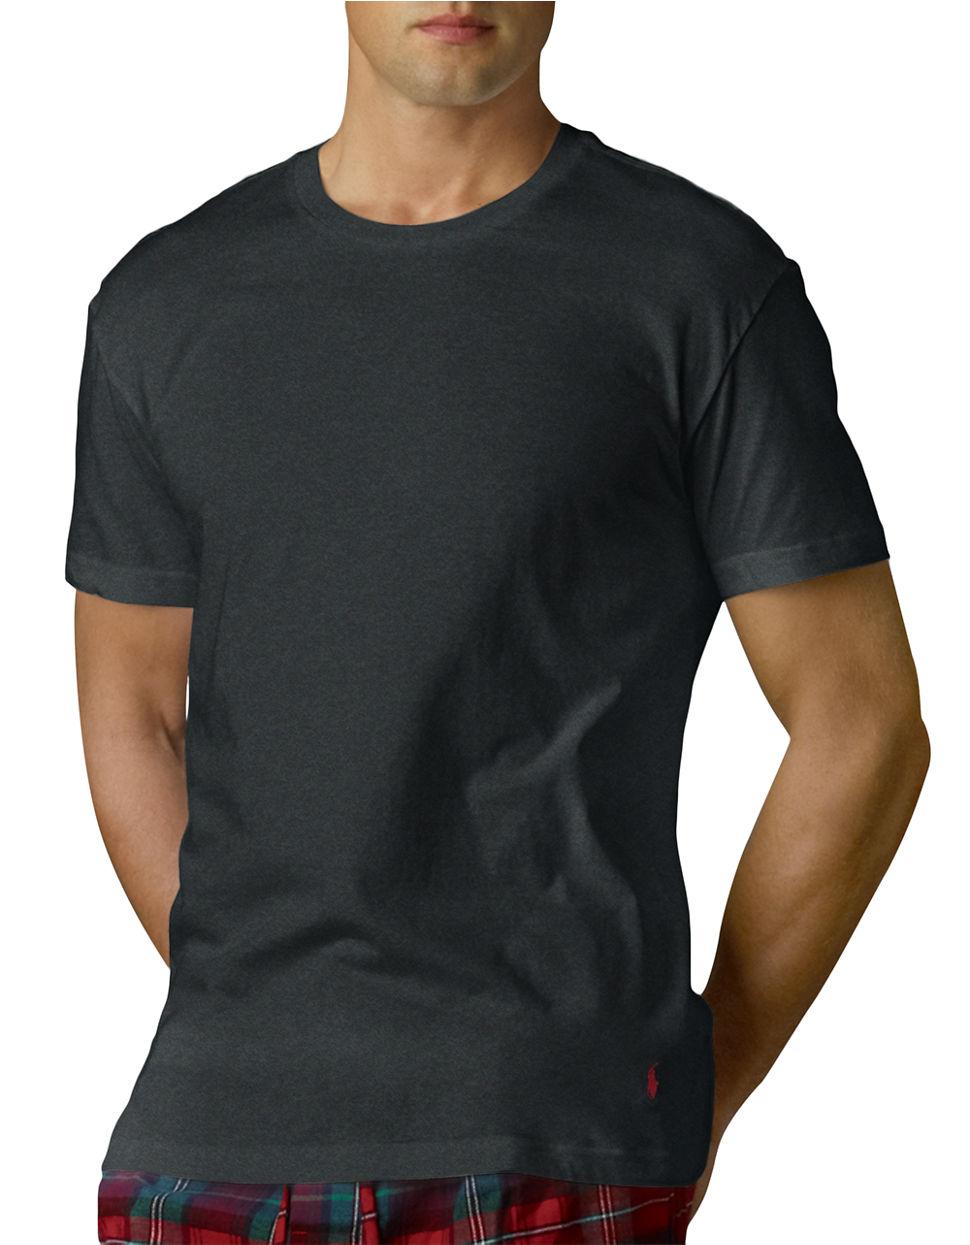 polo ralph lauren slim fit crew t shirt set for men save. Black Bedroom Furniture Sets. Home Design Ideas